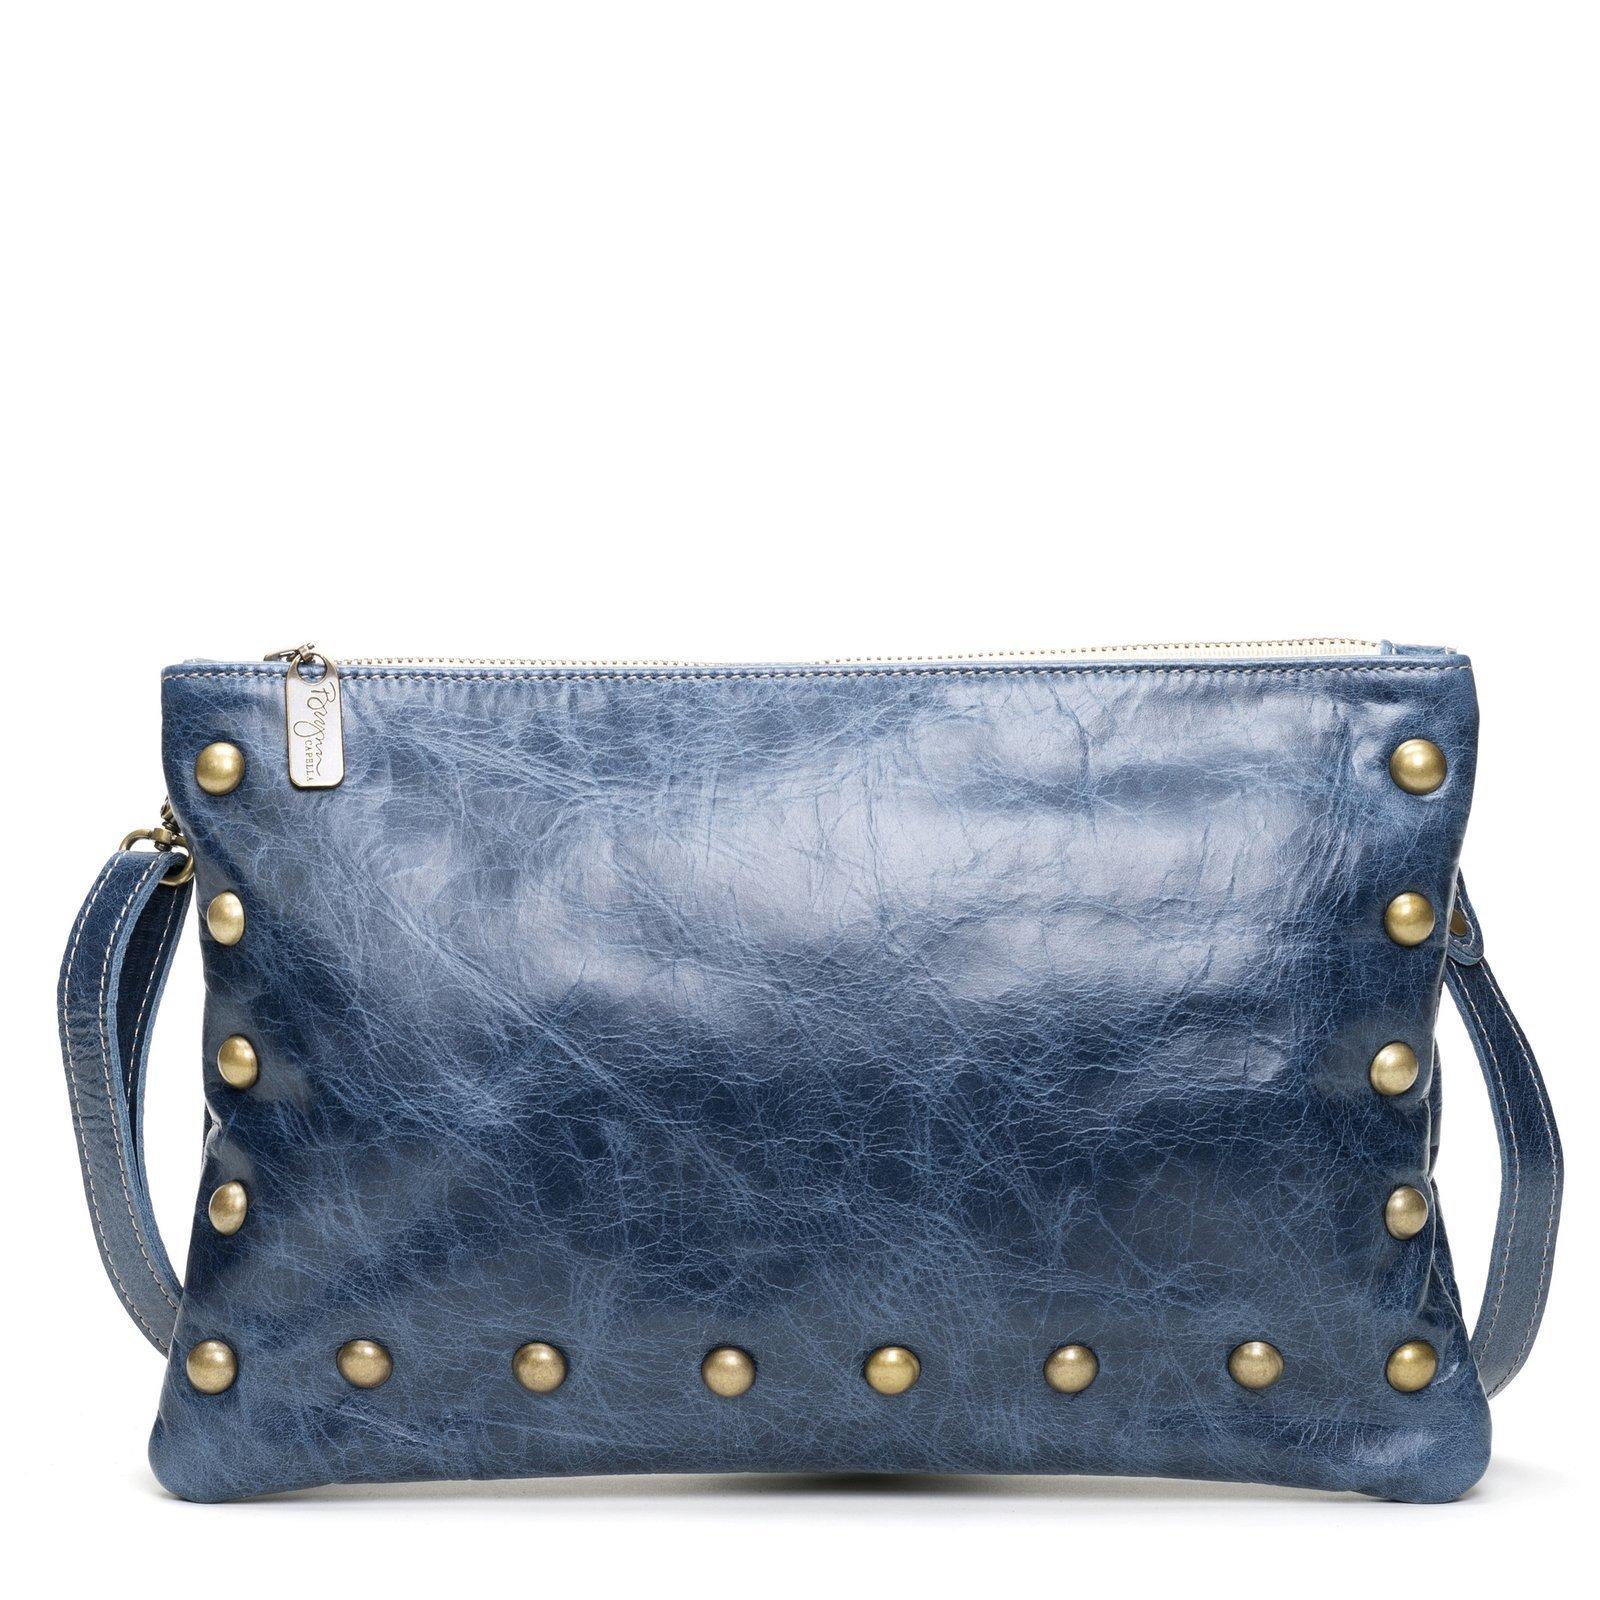 Blue Distressed Italian Leather Medium Crossbody Clutch